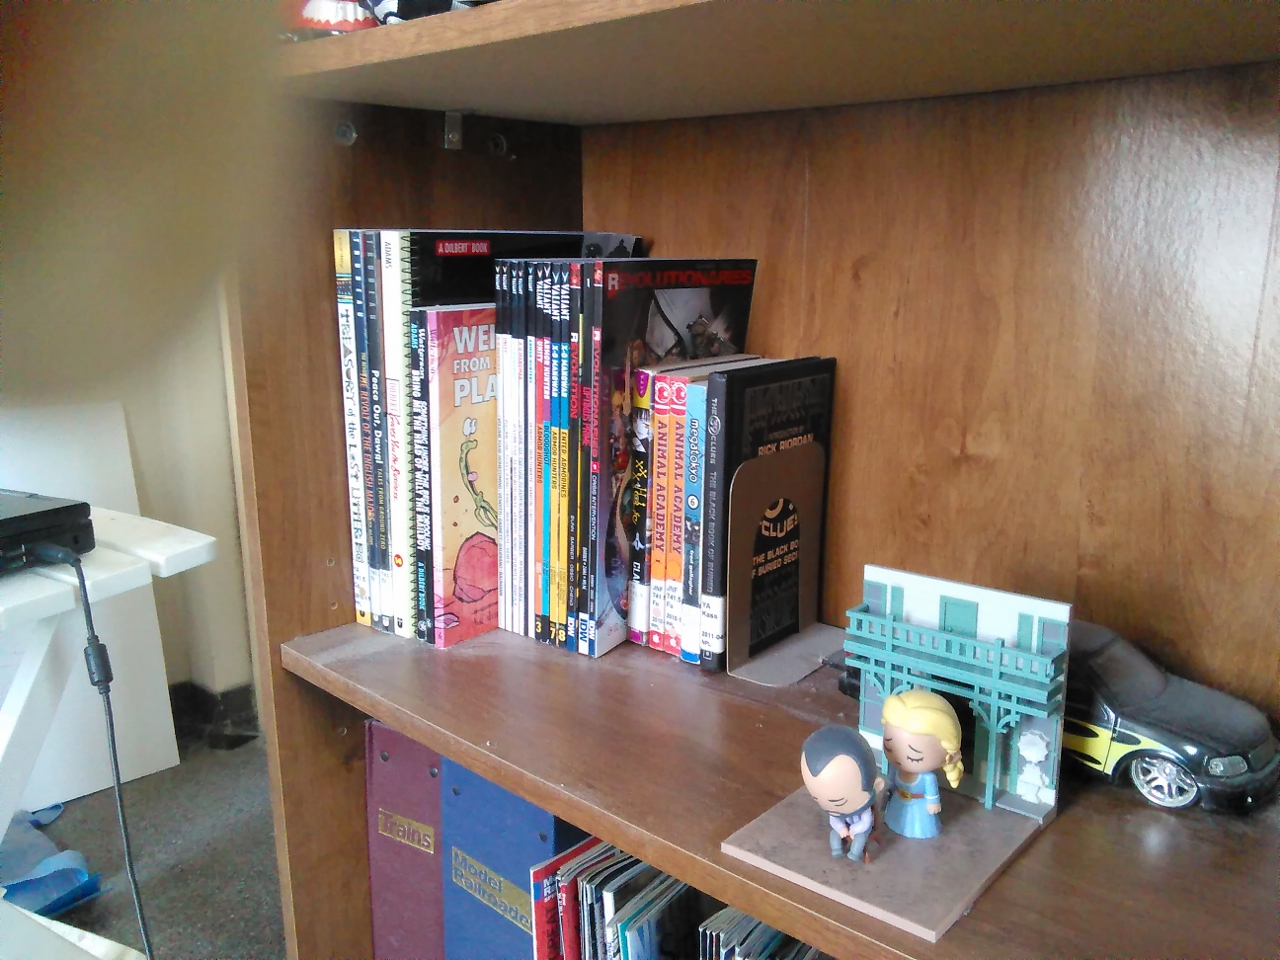 Bookshelf 5-23-2018 8-44-49 AM